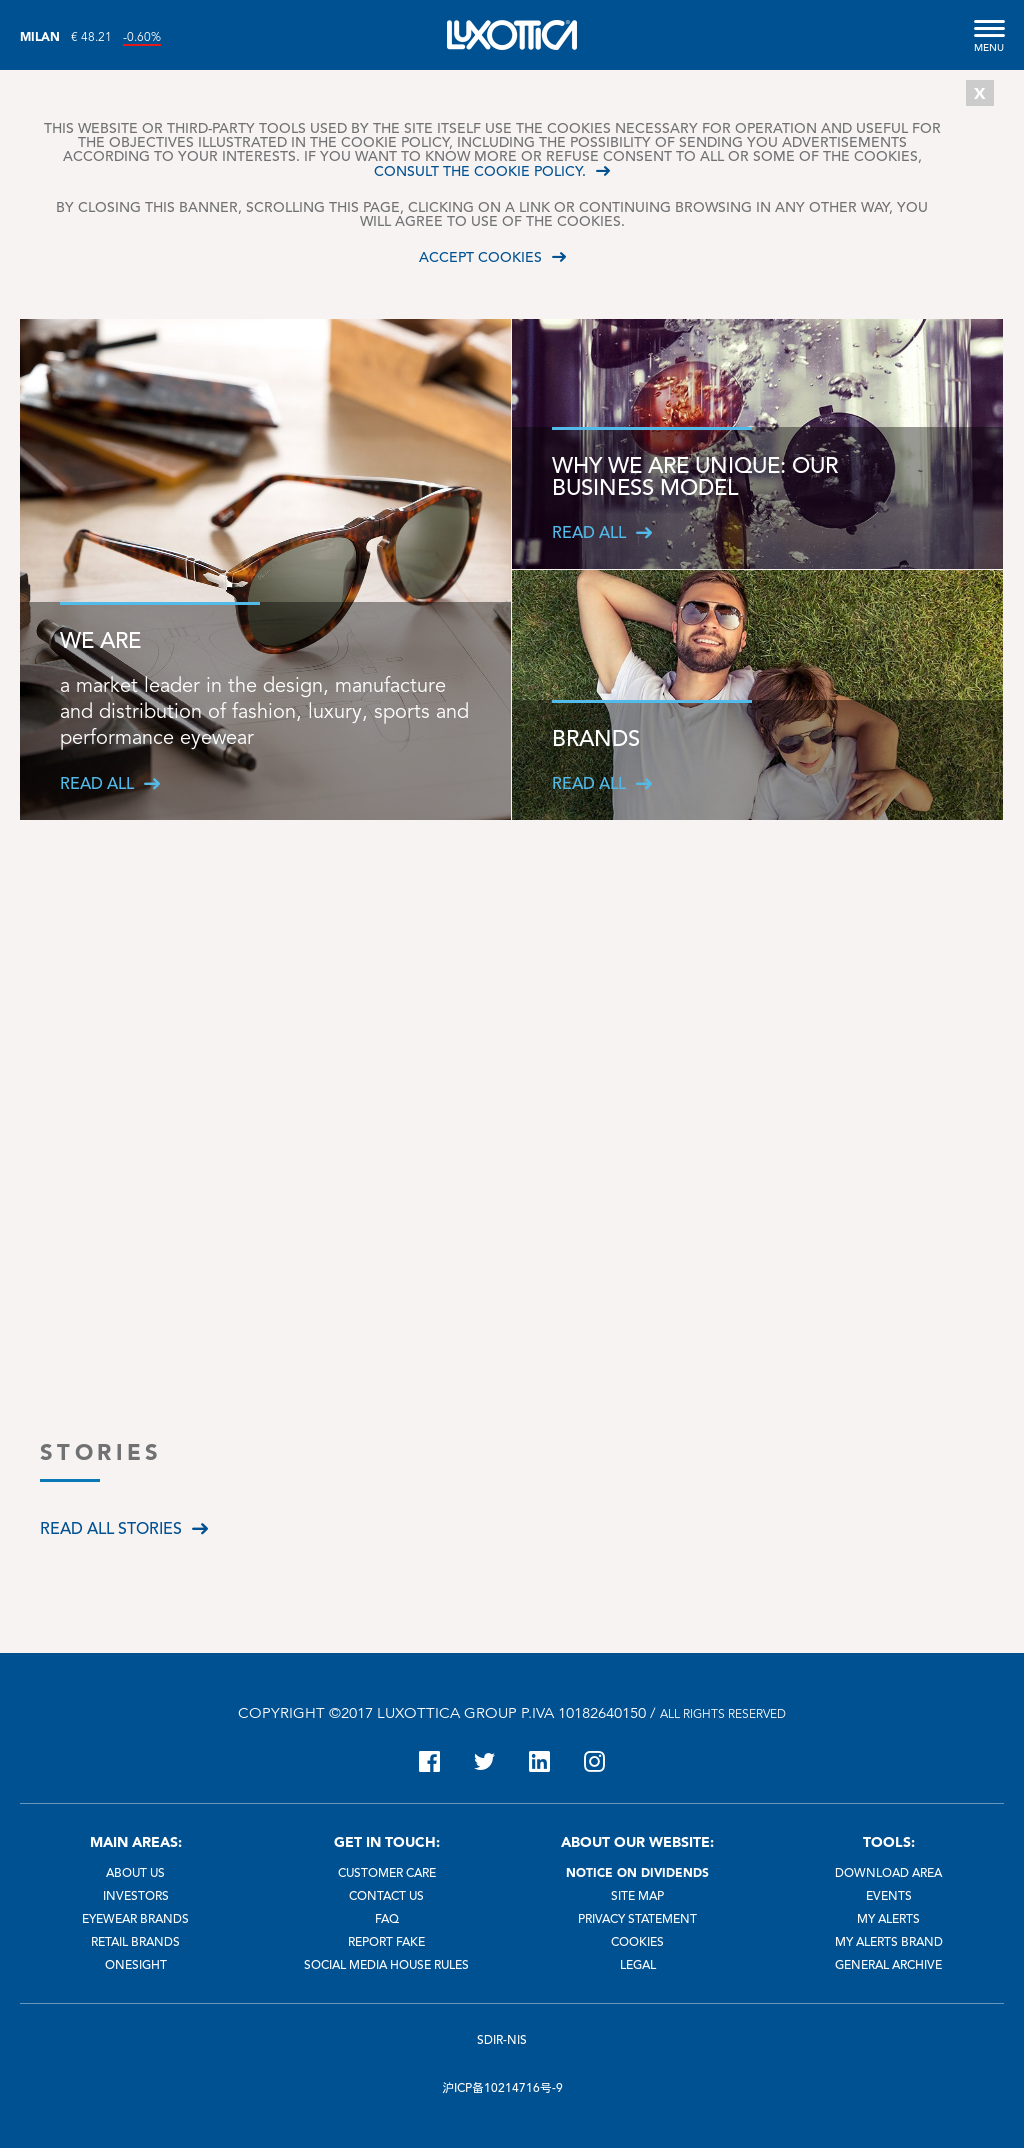 Luxottica Competitors, Revenue and Employees - Owler Company Profile